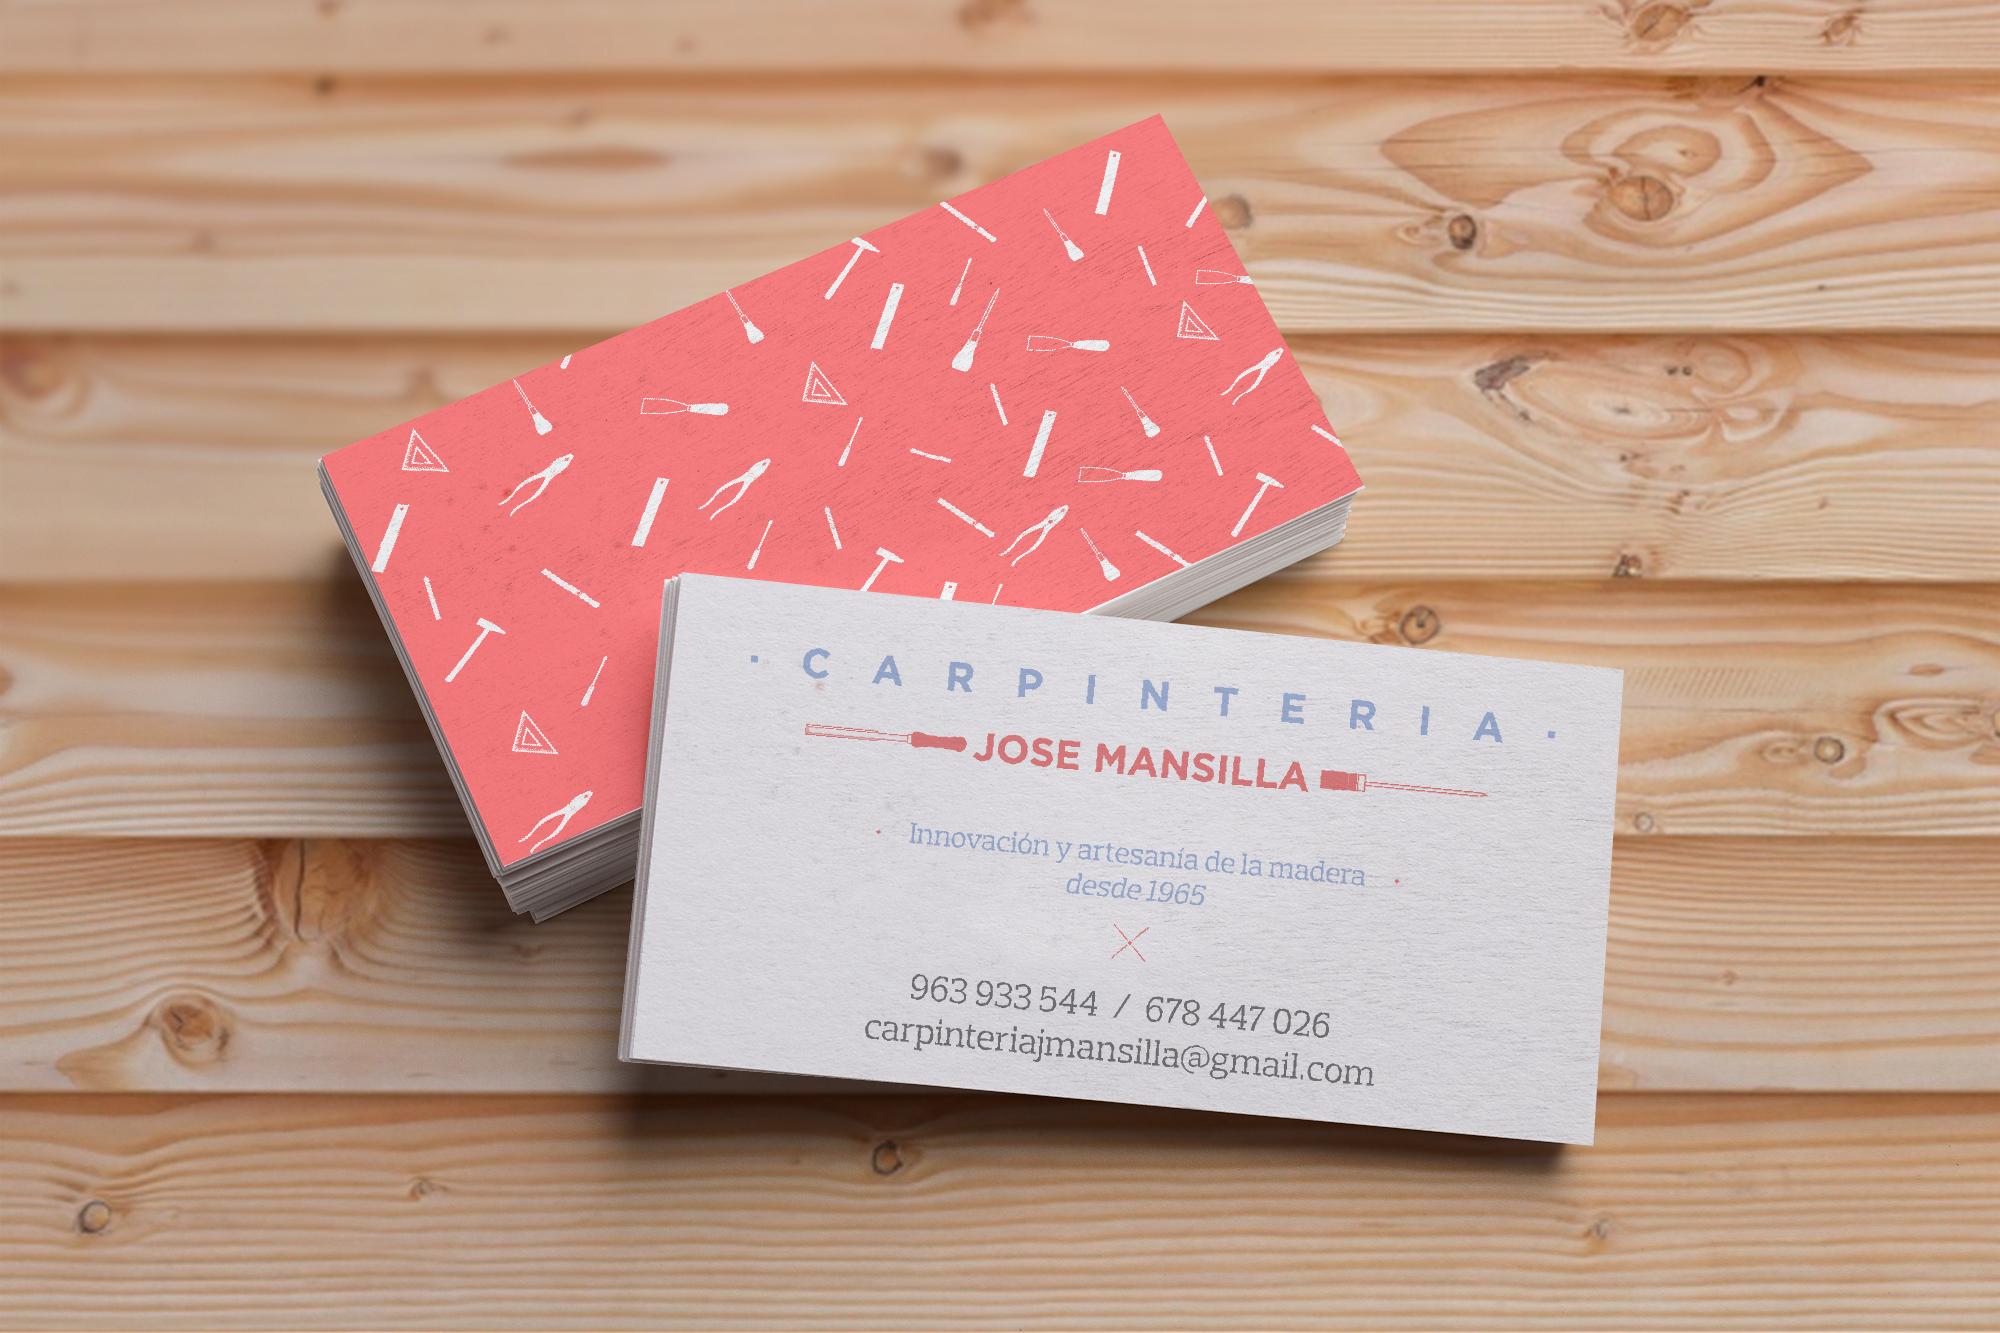 archicercle jose mansilla tarjetas